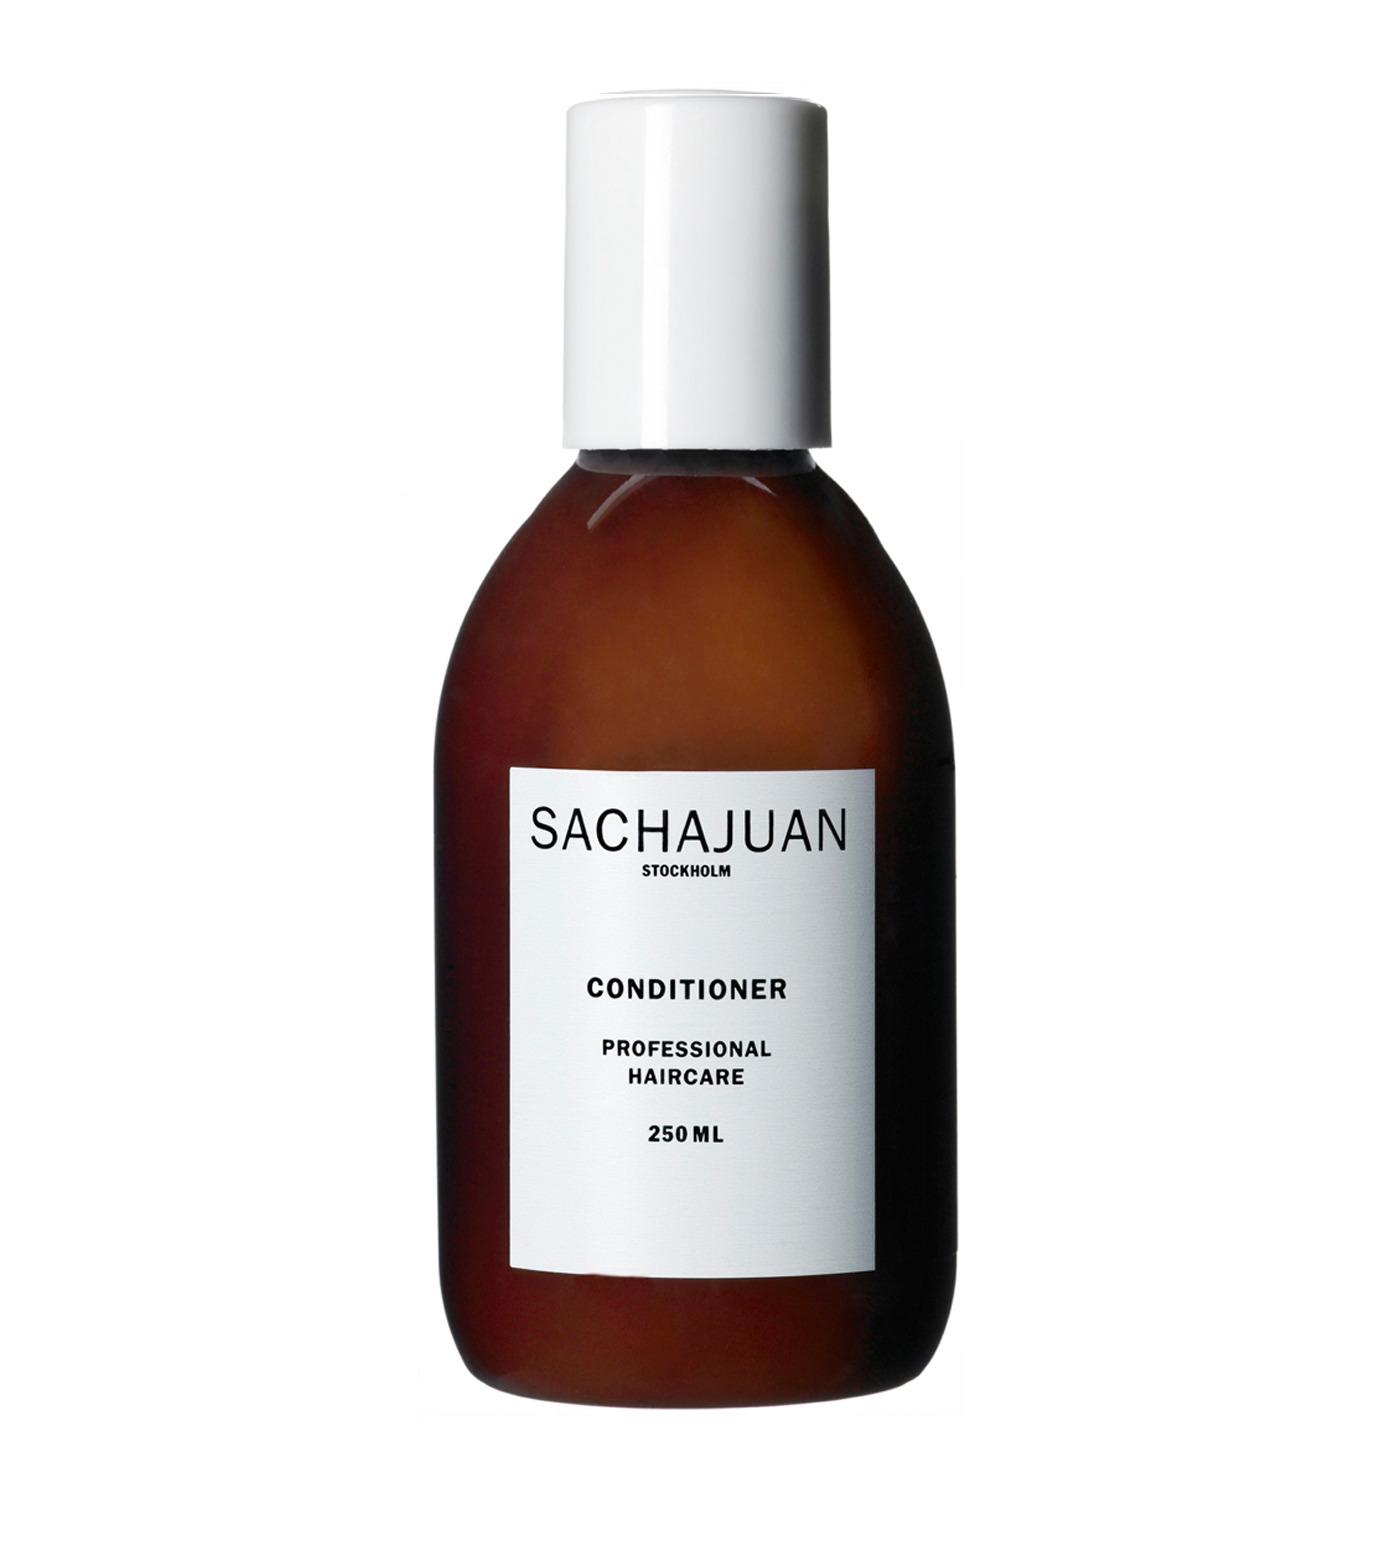 SACHAJUAN(サシャワン)のConditioner 250ml-WHITE(HAIR-CARE/HAIR-CARE)-104-4 拡大詳細画像1